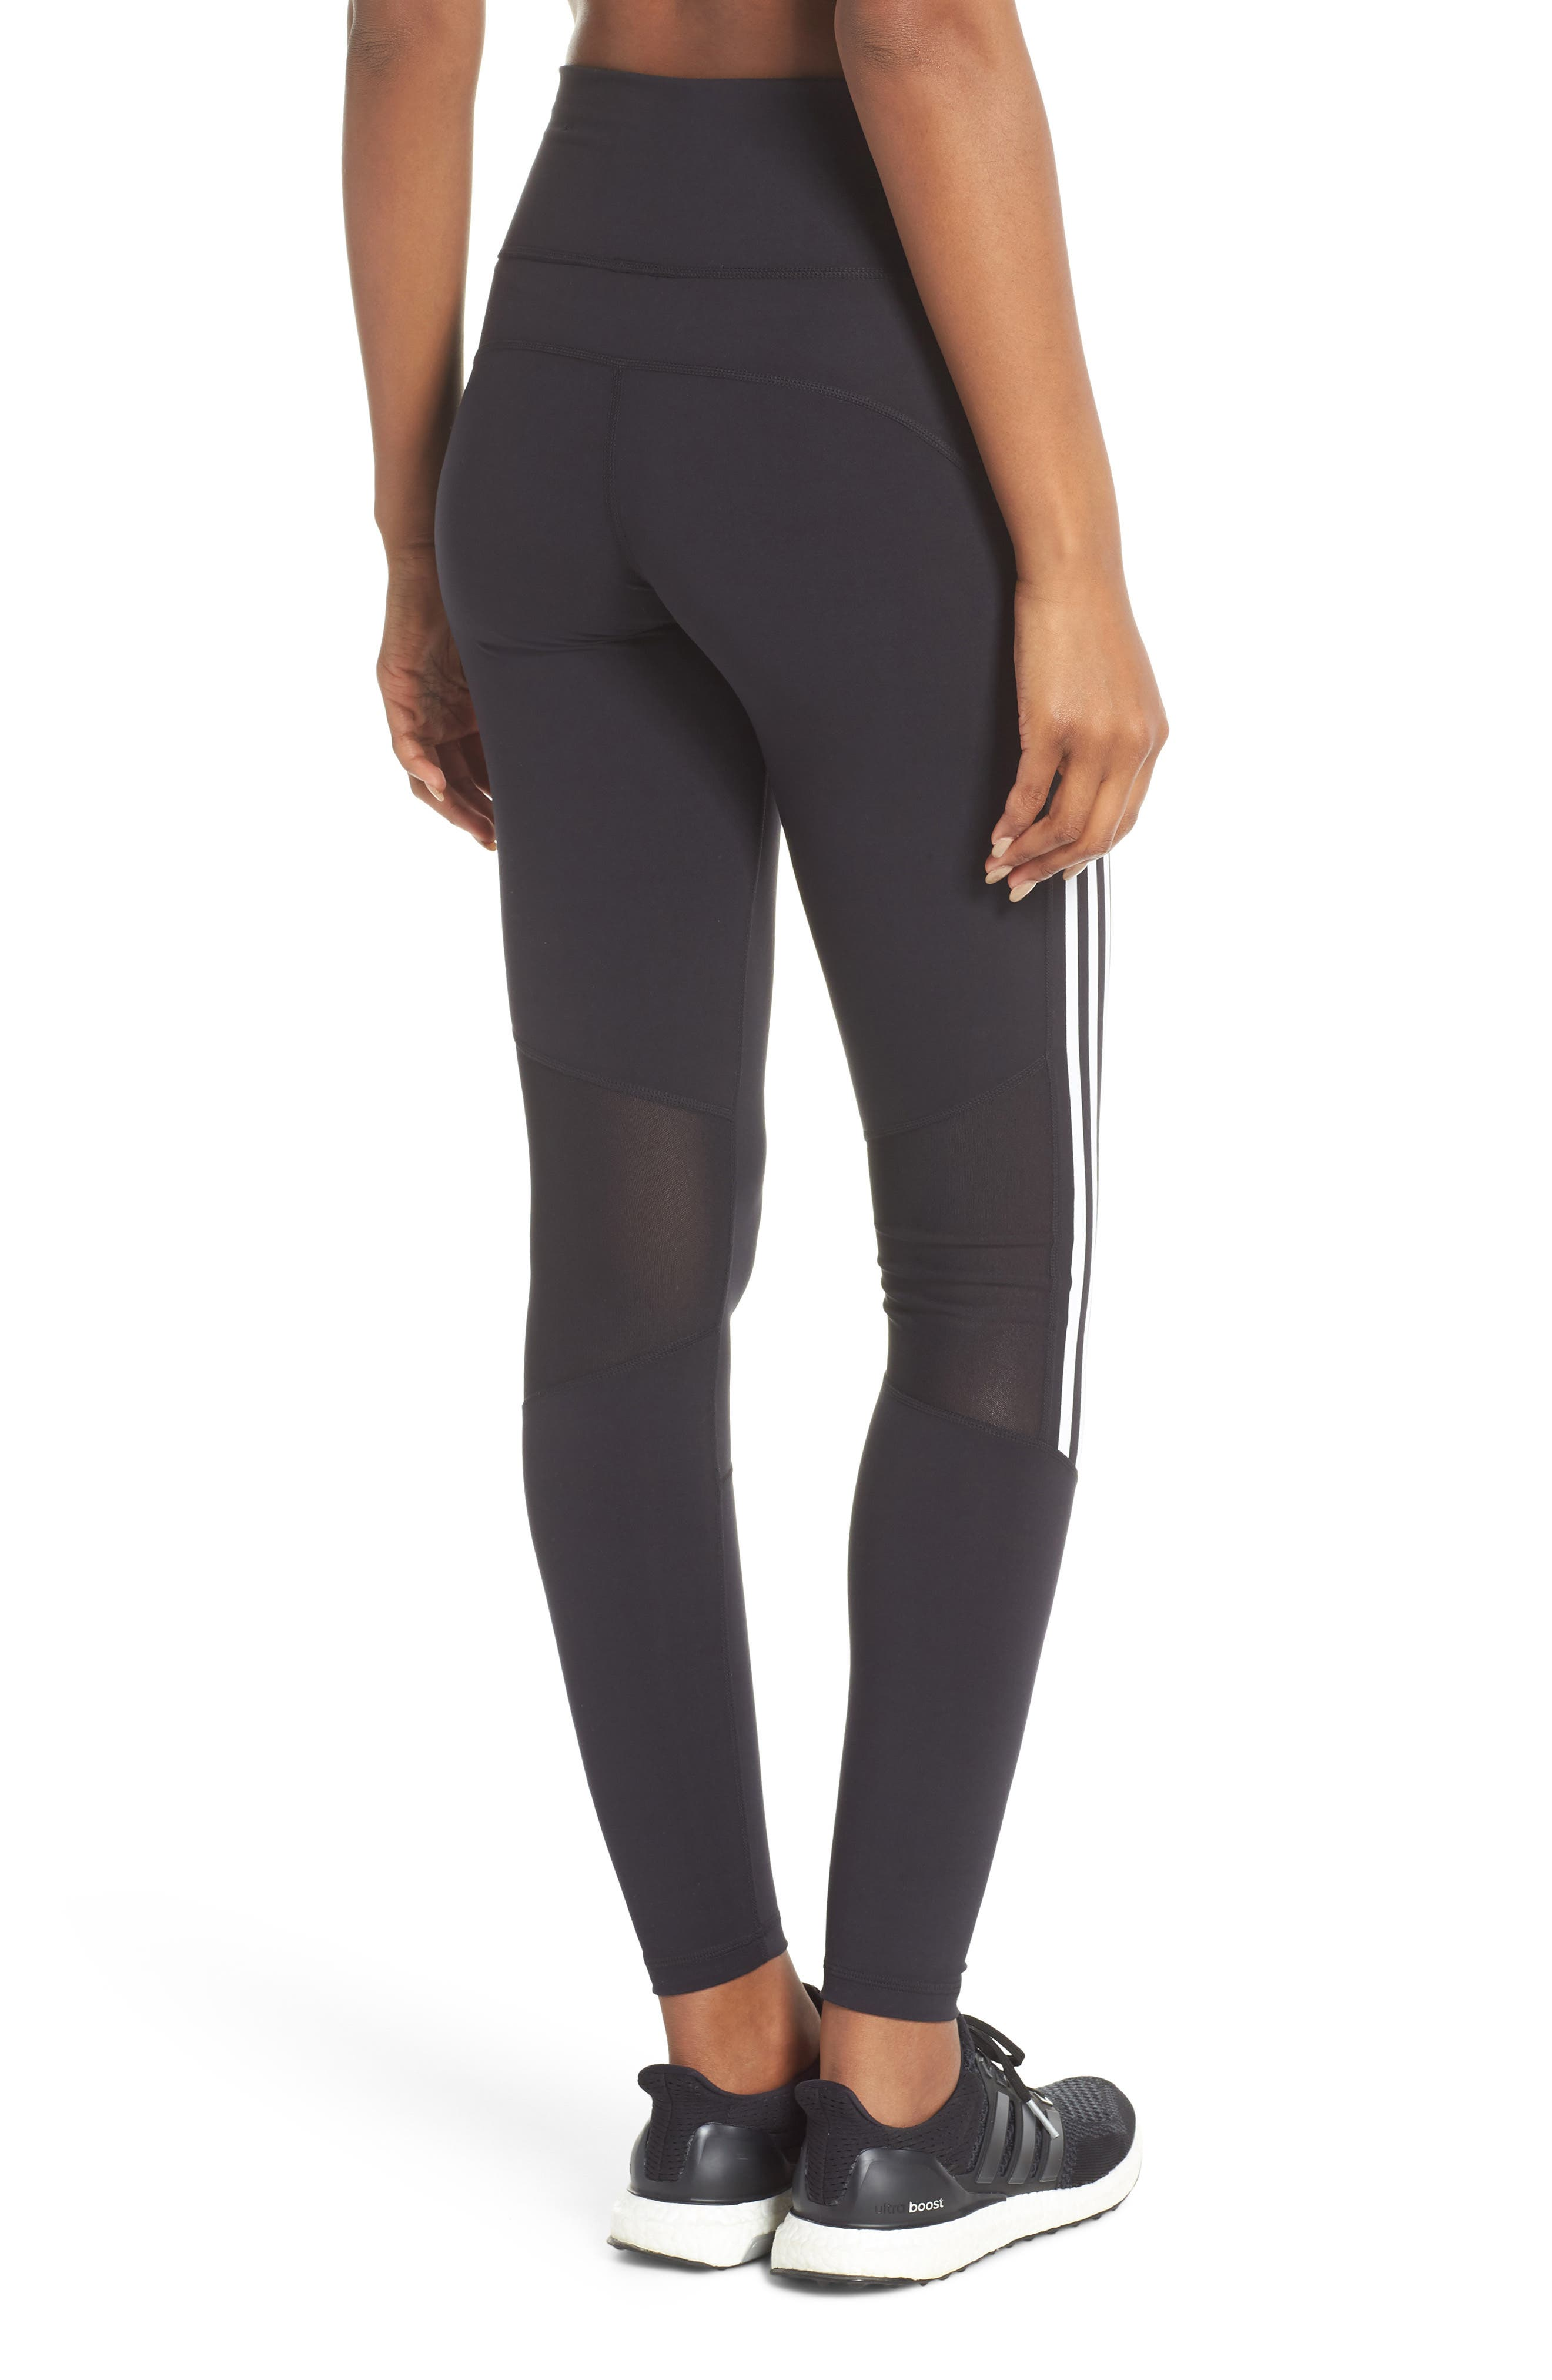 Believe This 3-Stripes High Waist Ankle Leggings,                             Alternate thumbnail 2, color,                             BLACK/ WHITE